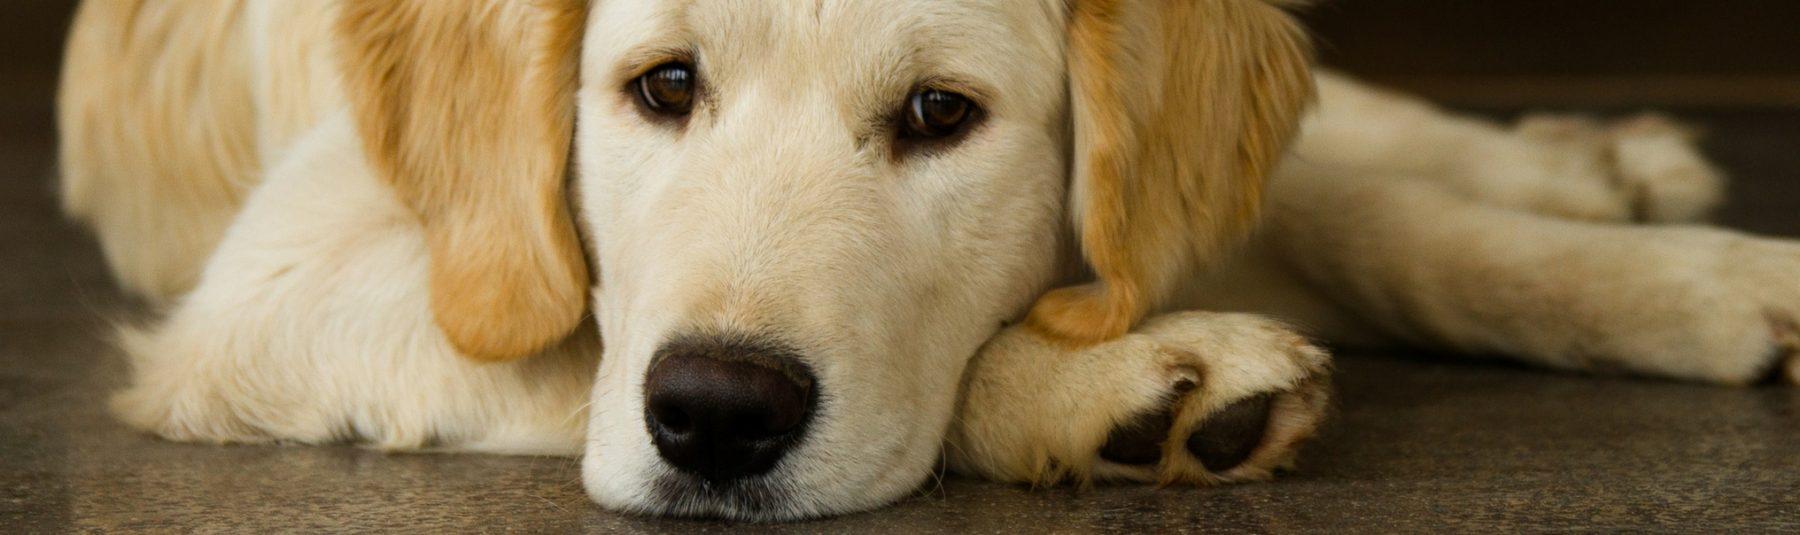 dog-heartworm-treatment